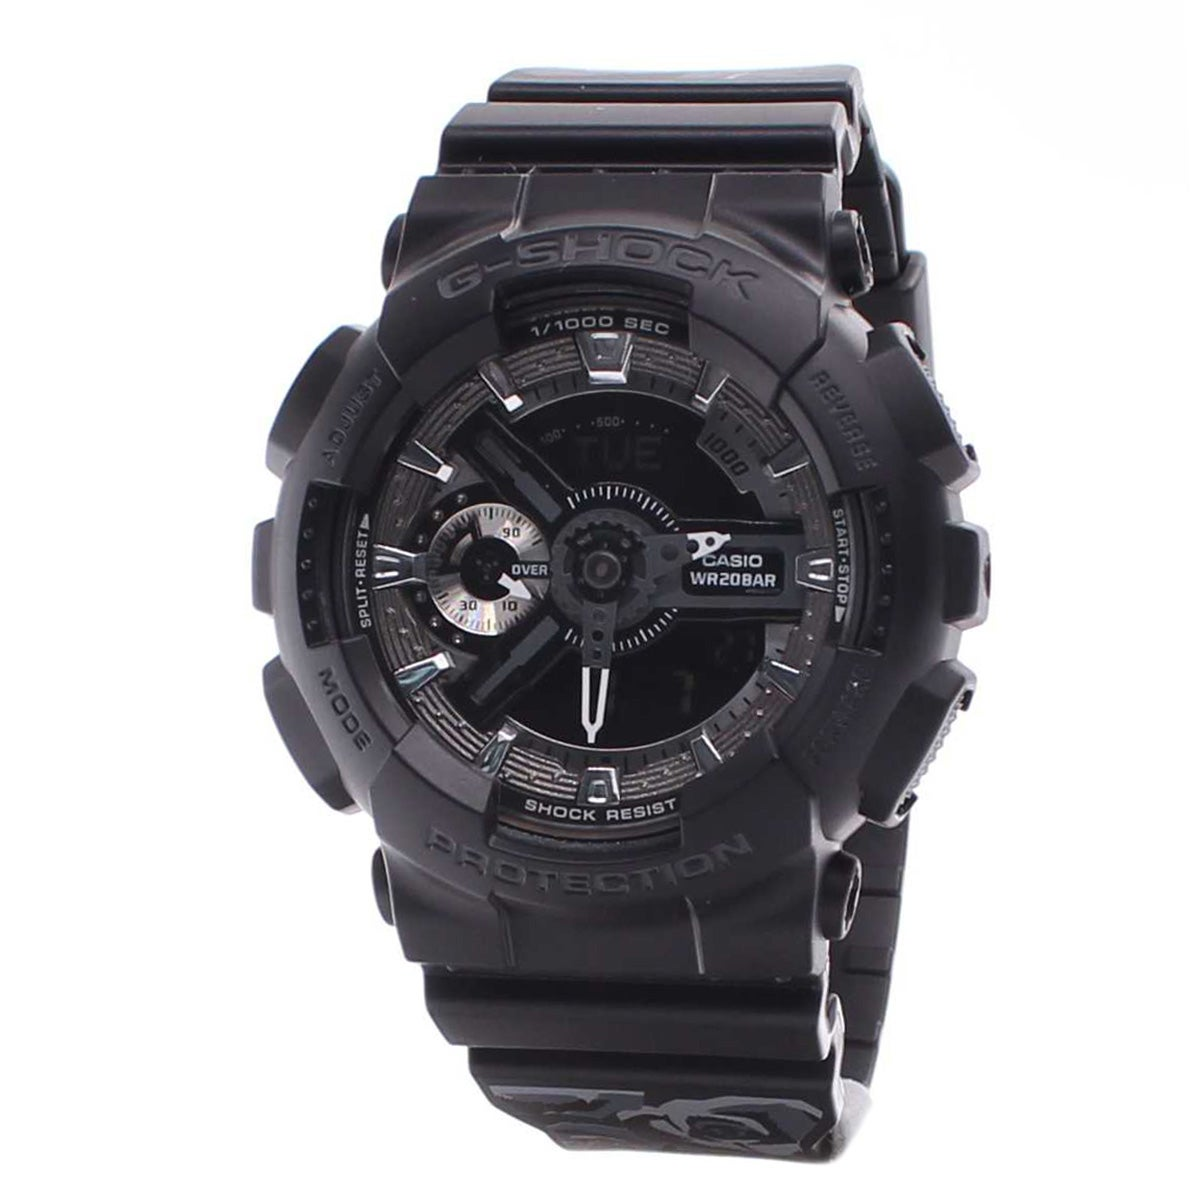 Casio Womens G-Shock S Series Black Rubber Floral Pattern Watch